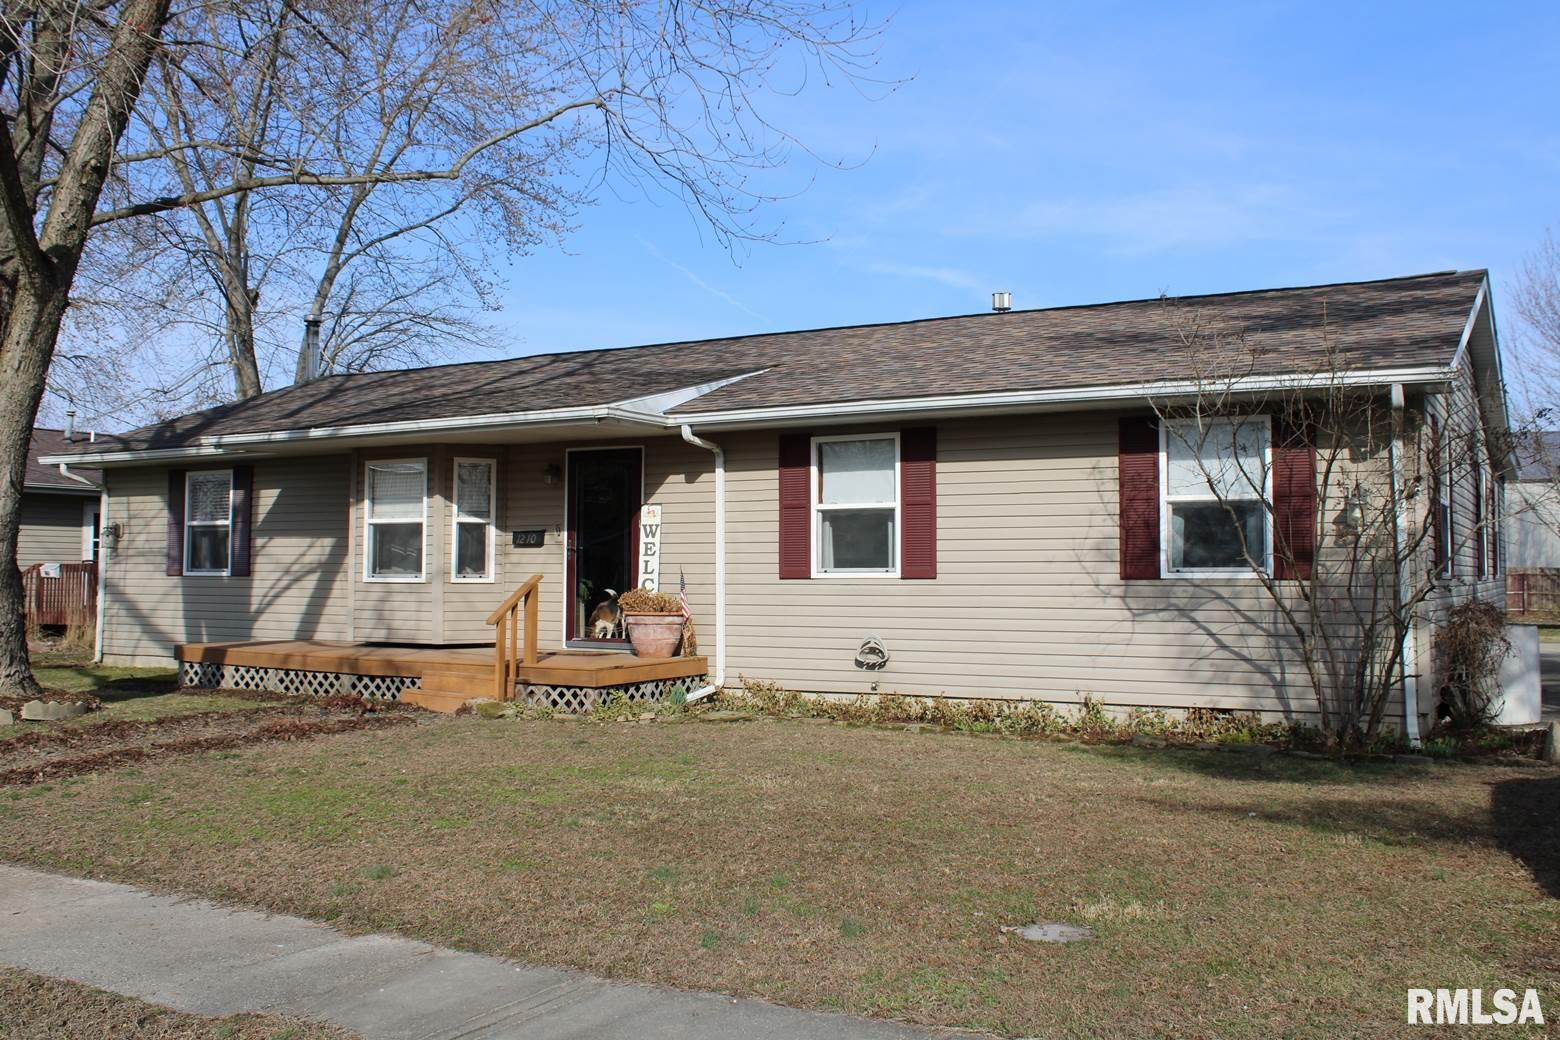 1210 S MAPLE Property Photo - Salem, IL real estate listing